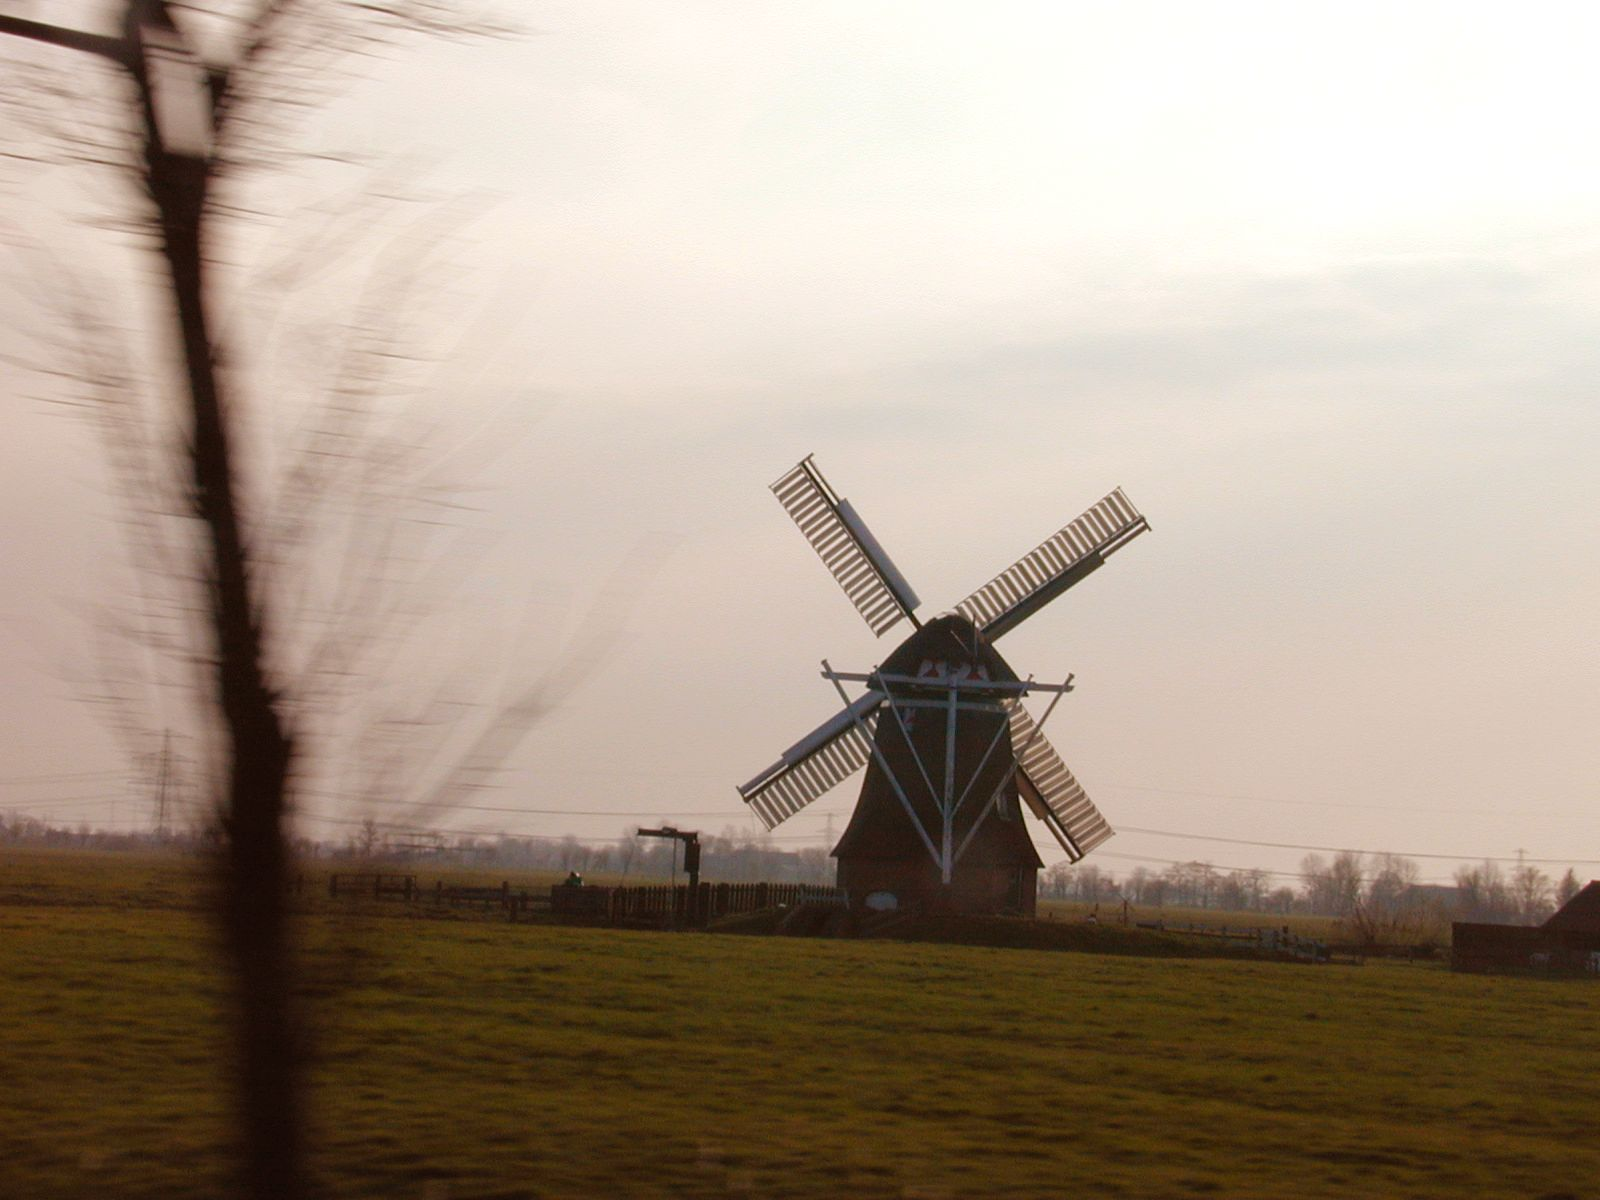 mill speed dutch windmill polder sky grass country textures